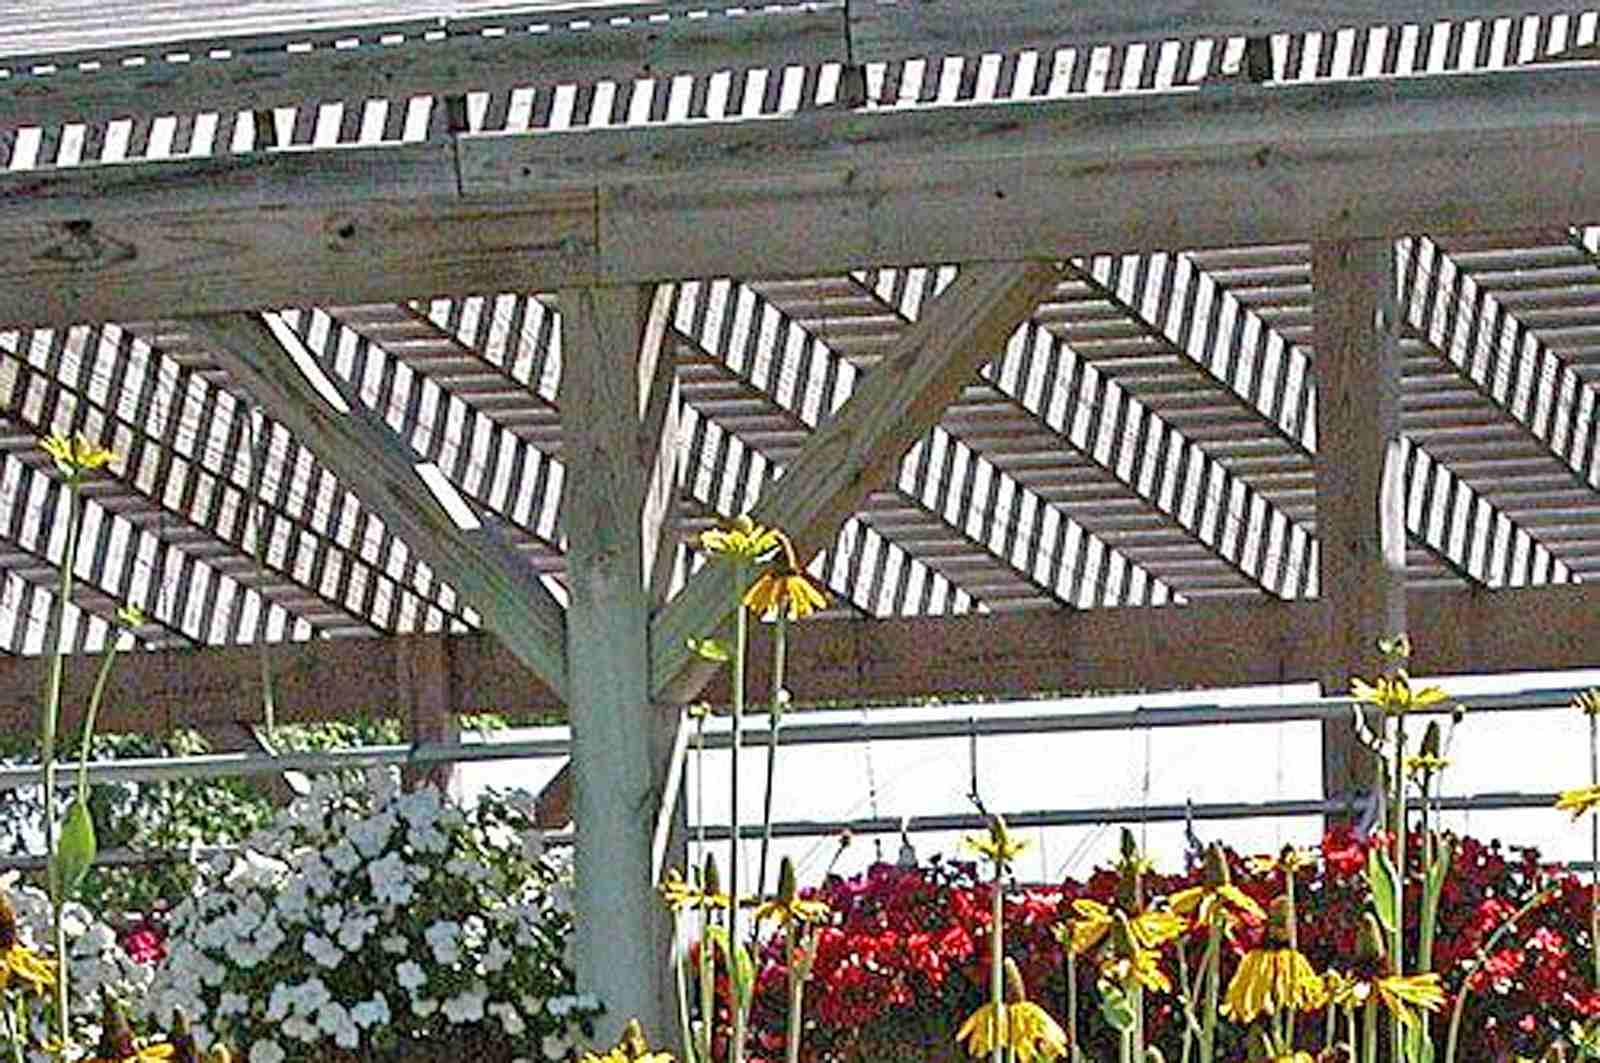 Lathe Arbor for Shading Plants